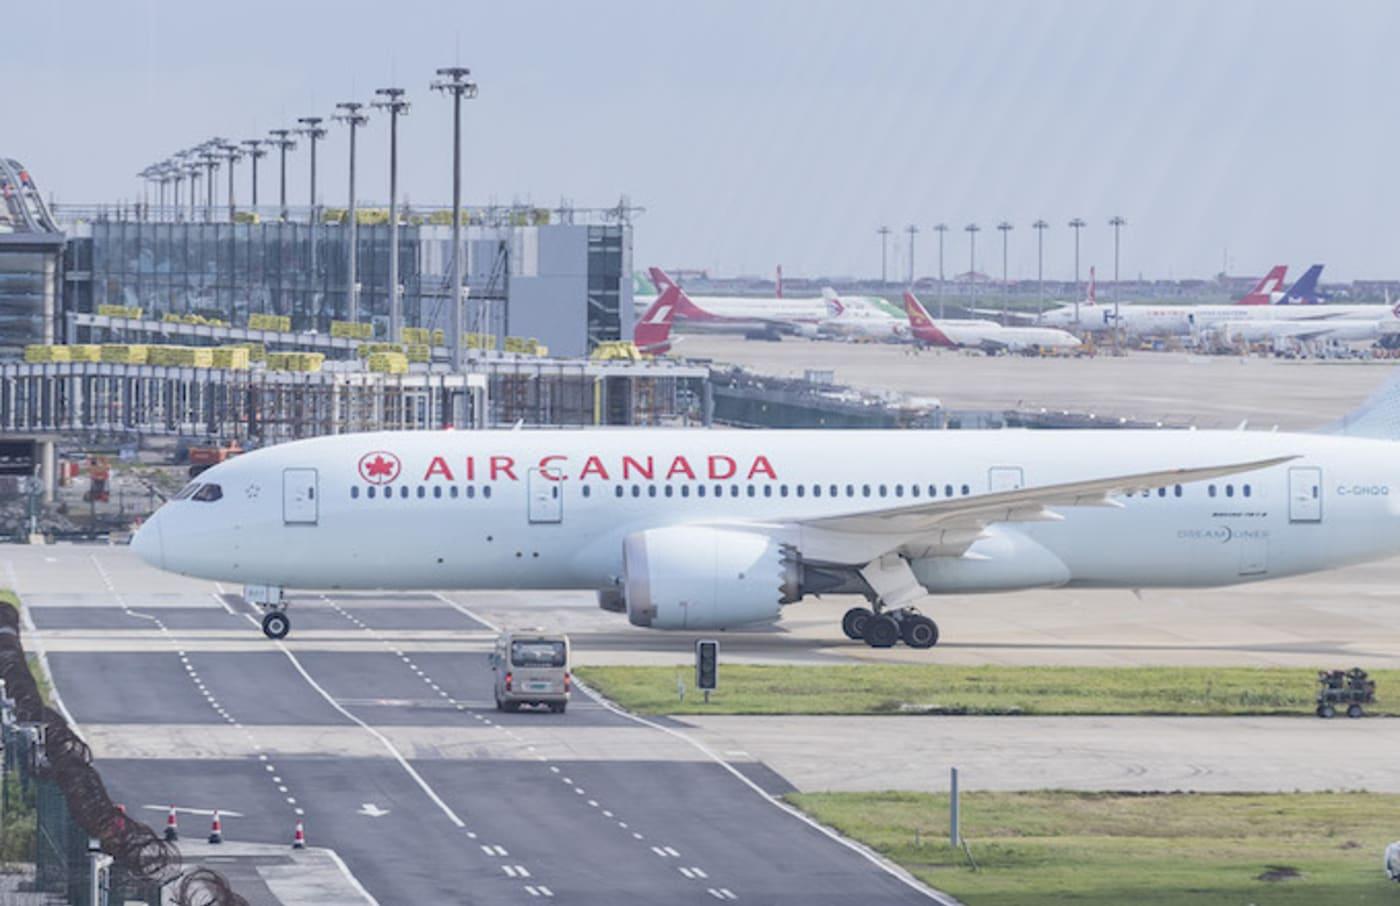 An Air Canada Boeing 787 8 Dreamliner in runaway at Shanghai Pudong International Airport.